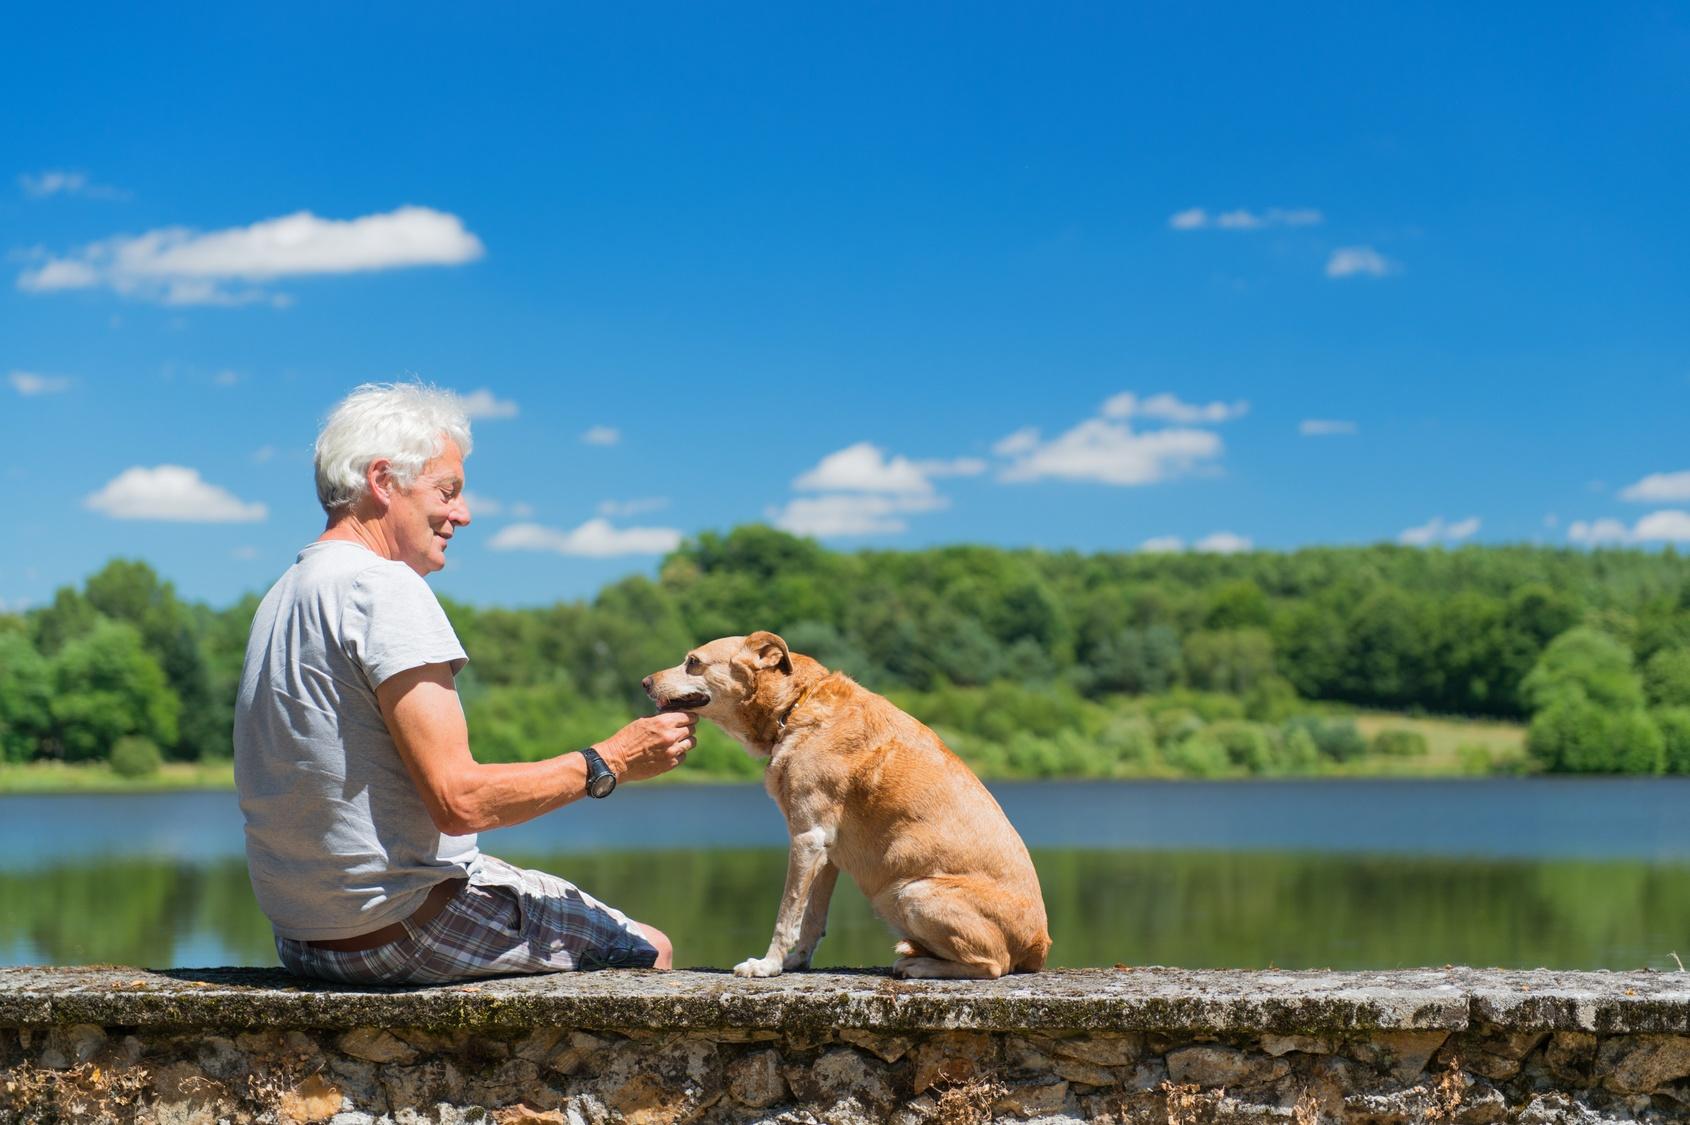 active-senior-with-dog.jpg